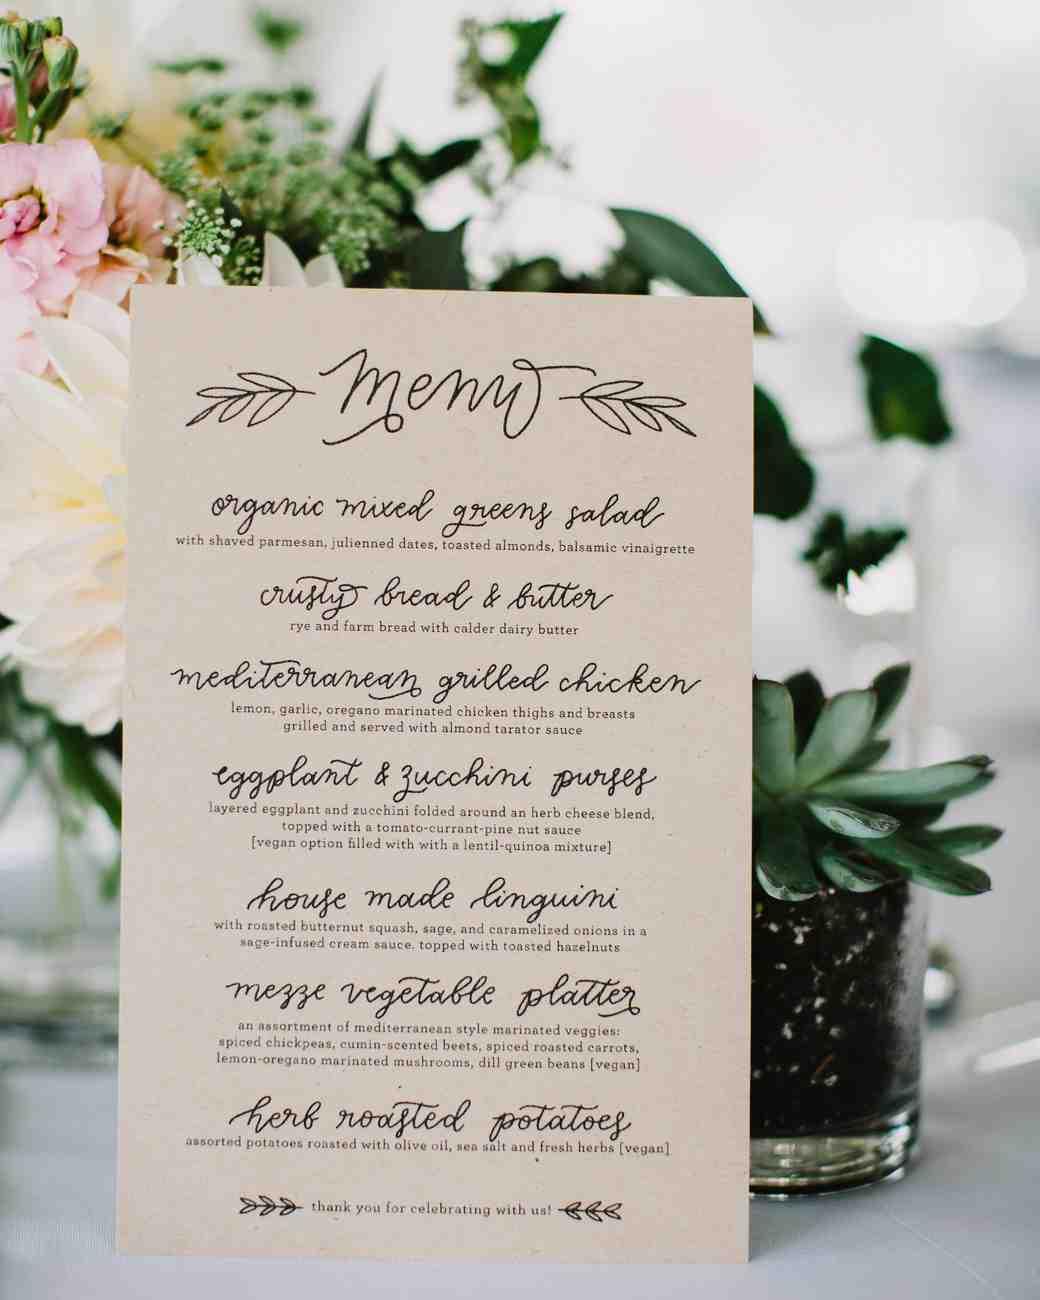 kristen-steve-wedding-menu-012-s113058-0616.jpg